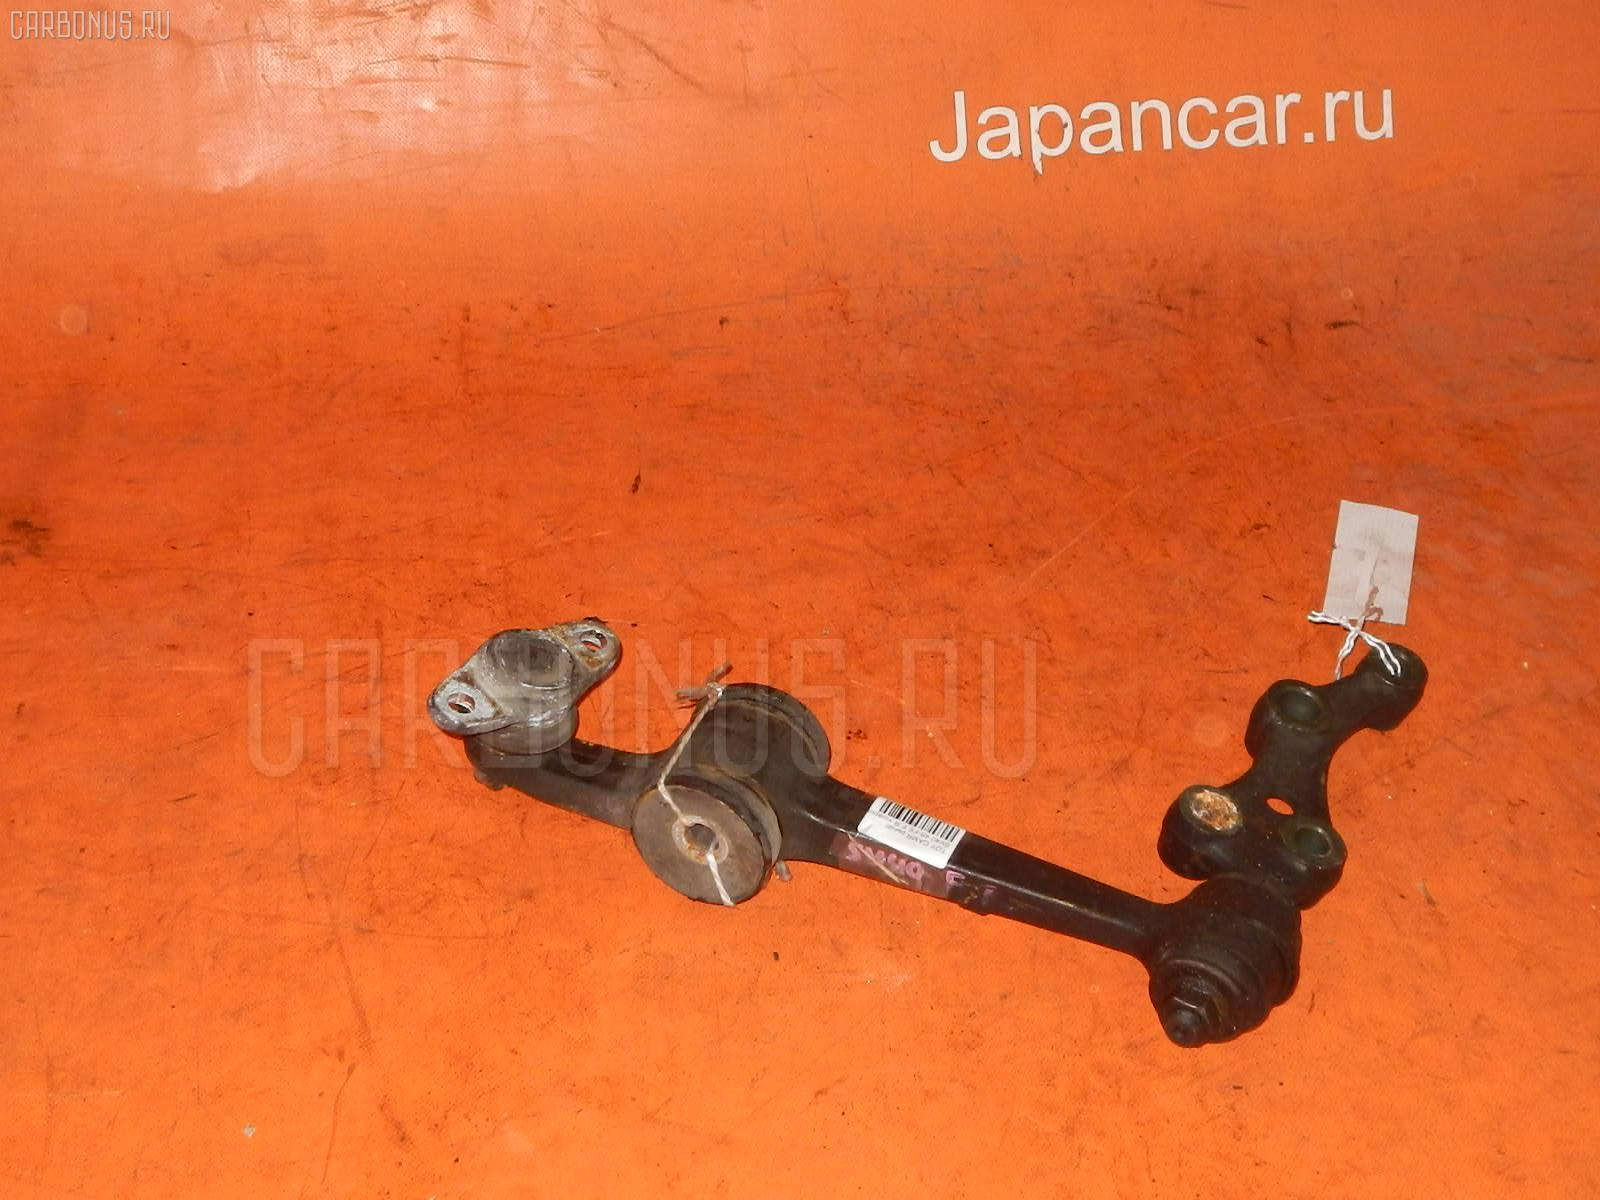 Рычаг Toyota Camry SV40 4S-FE Фото 1